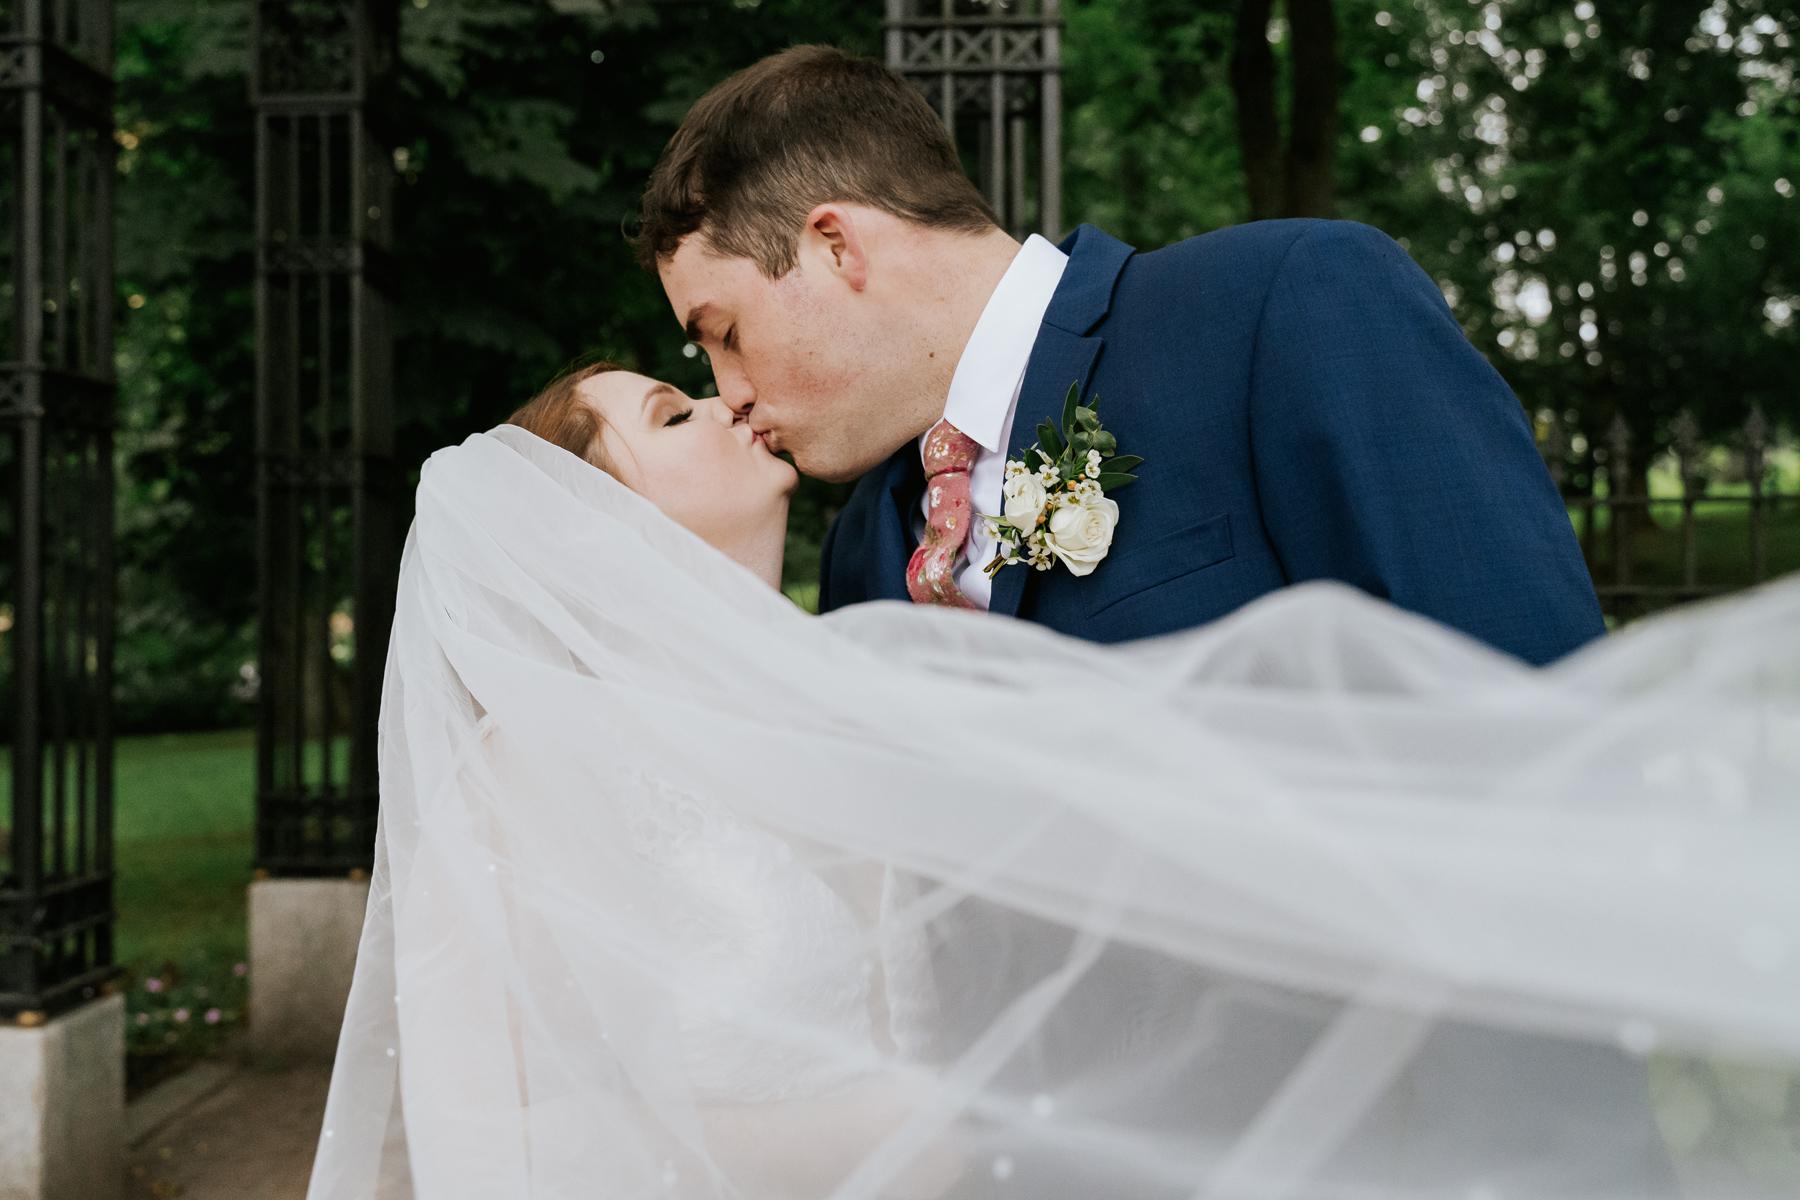 saint-john-cornerstone-wedding-kj2019-20